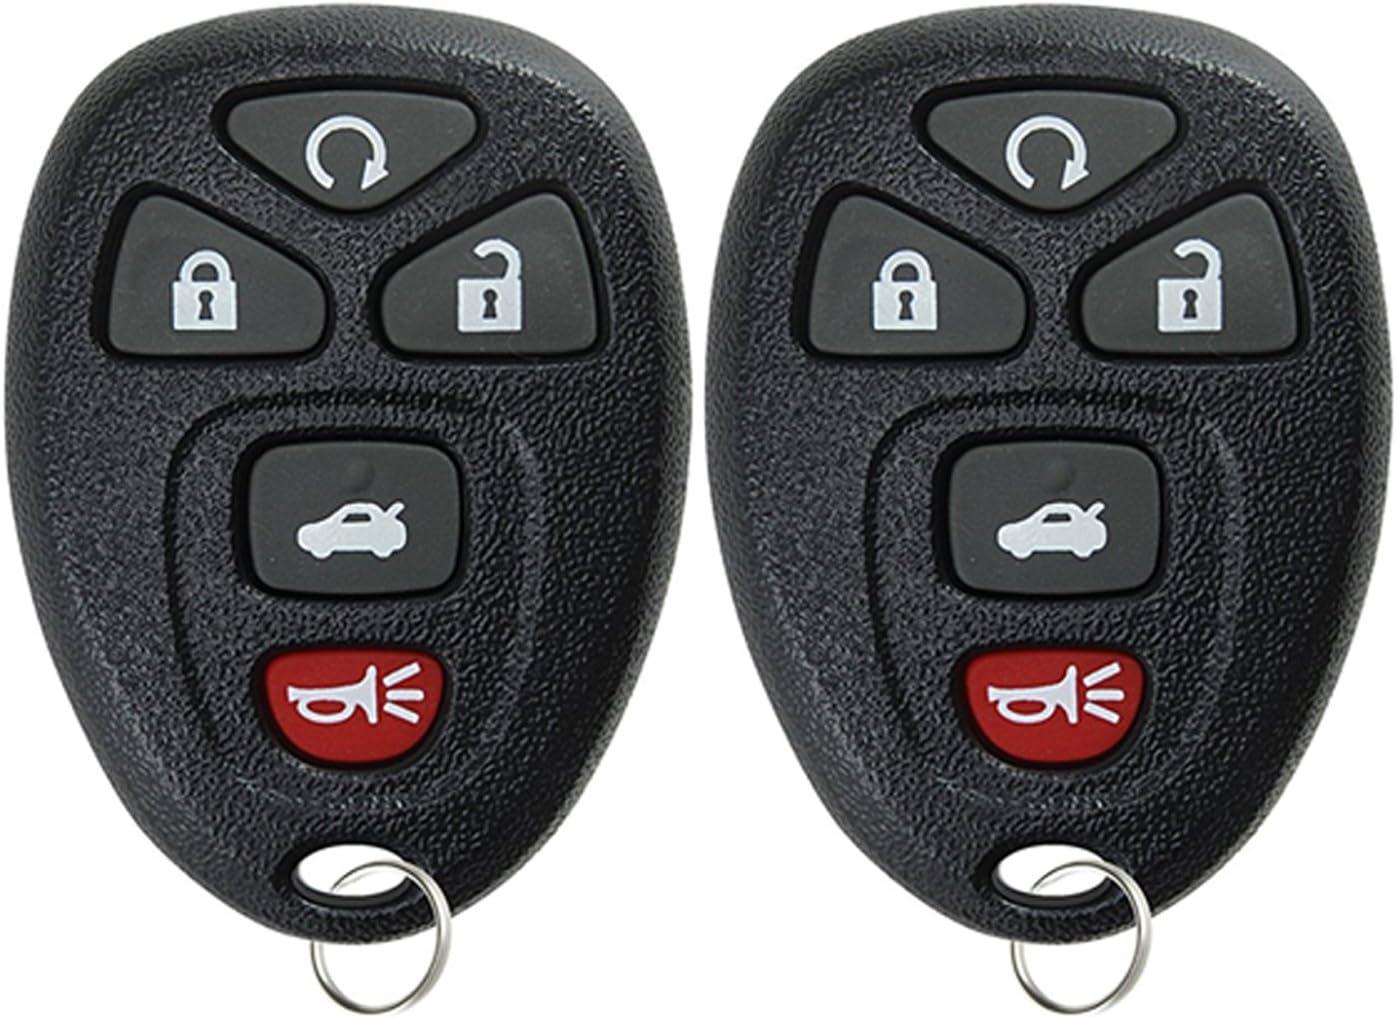 Ranking quality assurance TOP15 KeylessOption Keyless Entry Remote Start Car Rep Control Key Fob